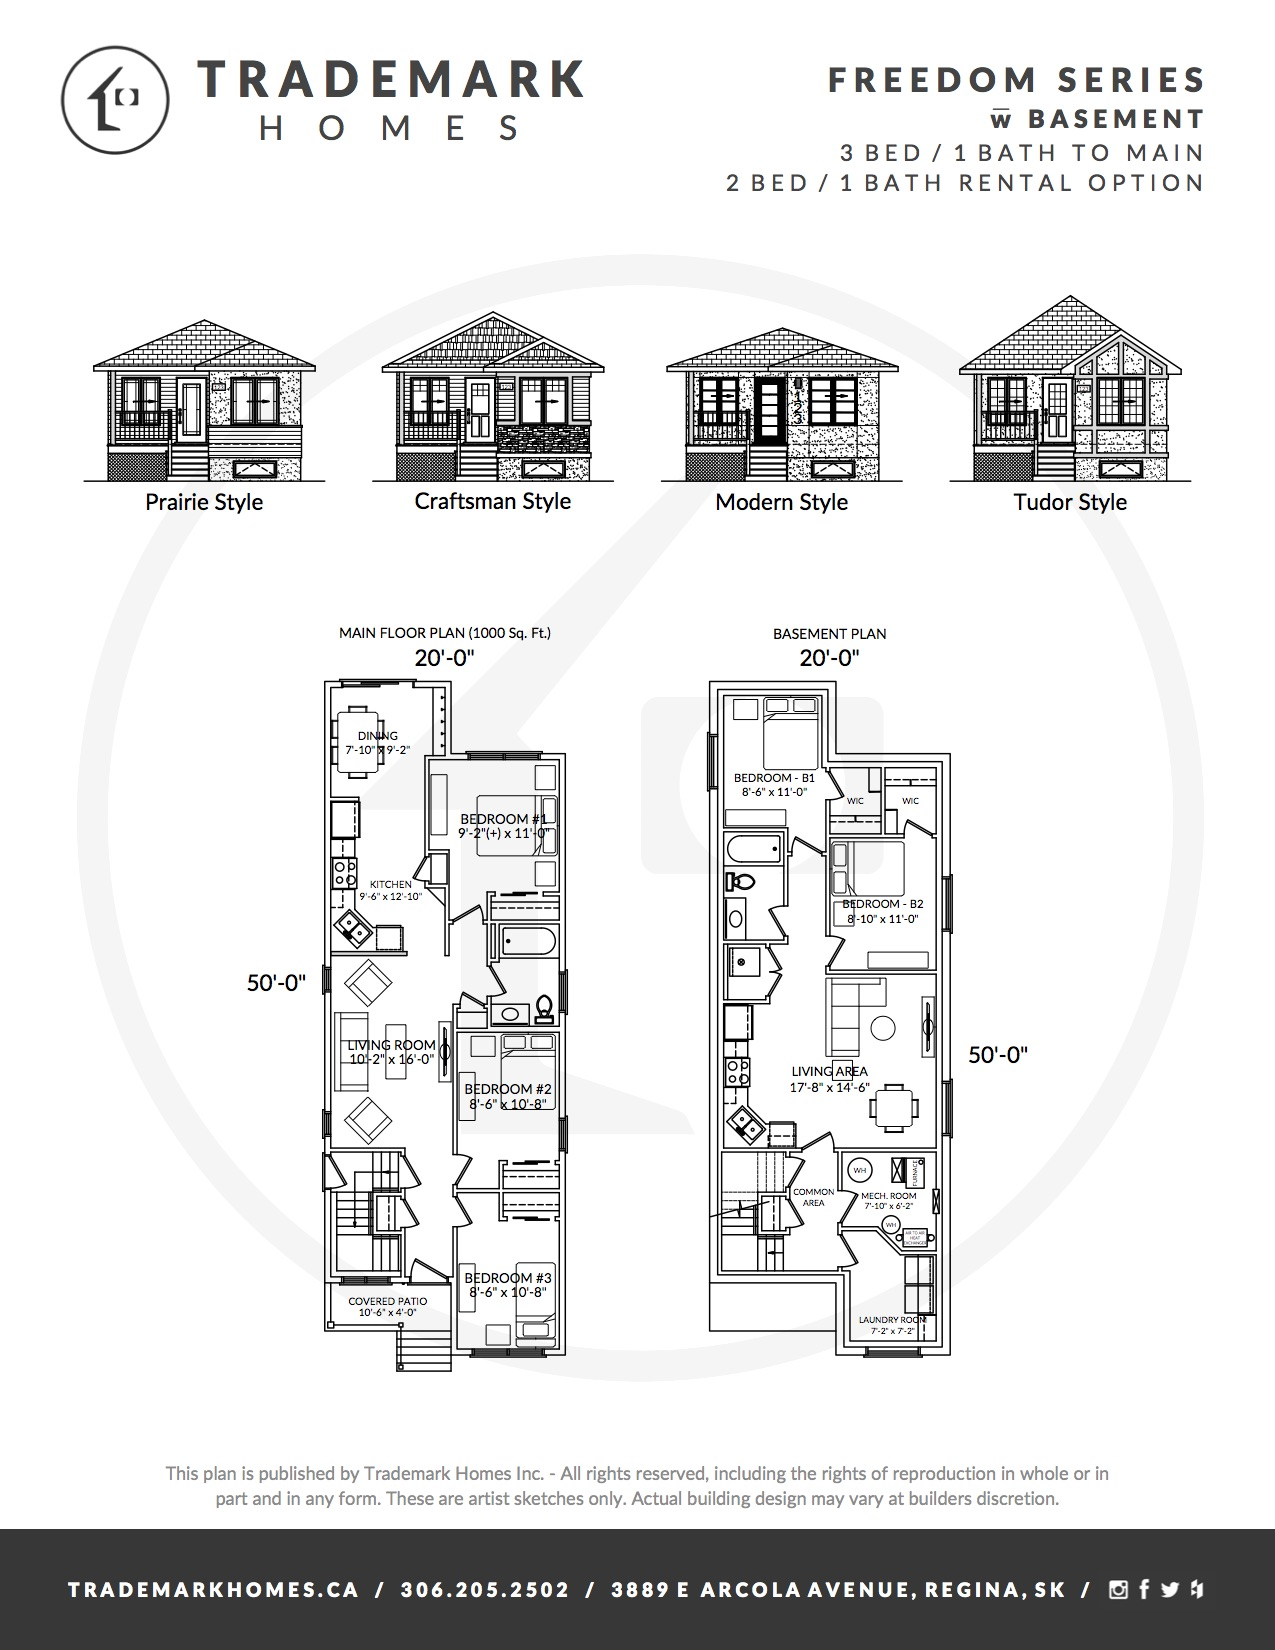 Freedom Series - With basement - Floorplan - Regina Home Builder